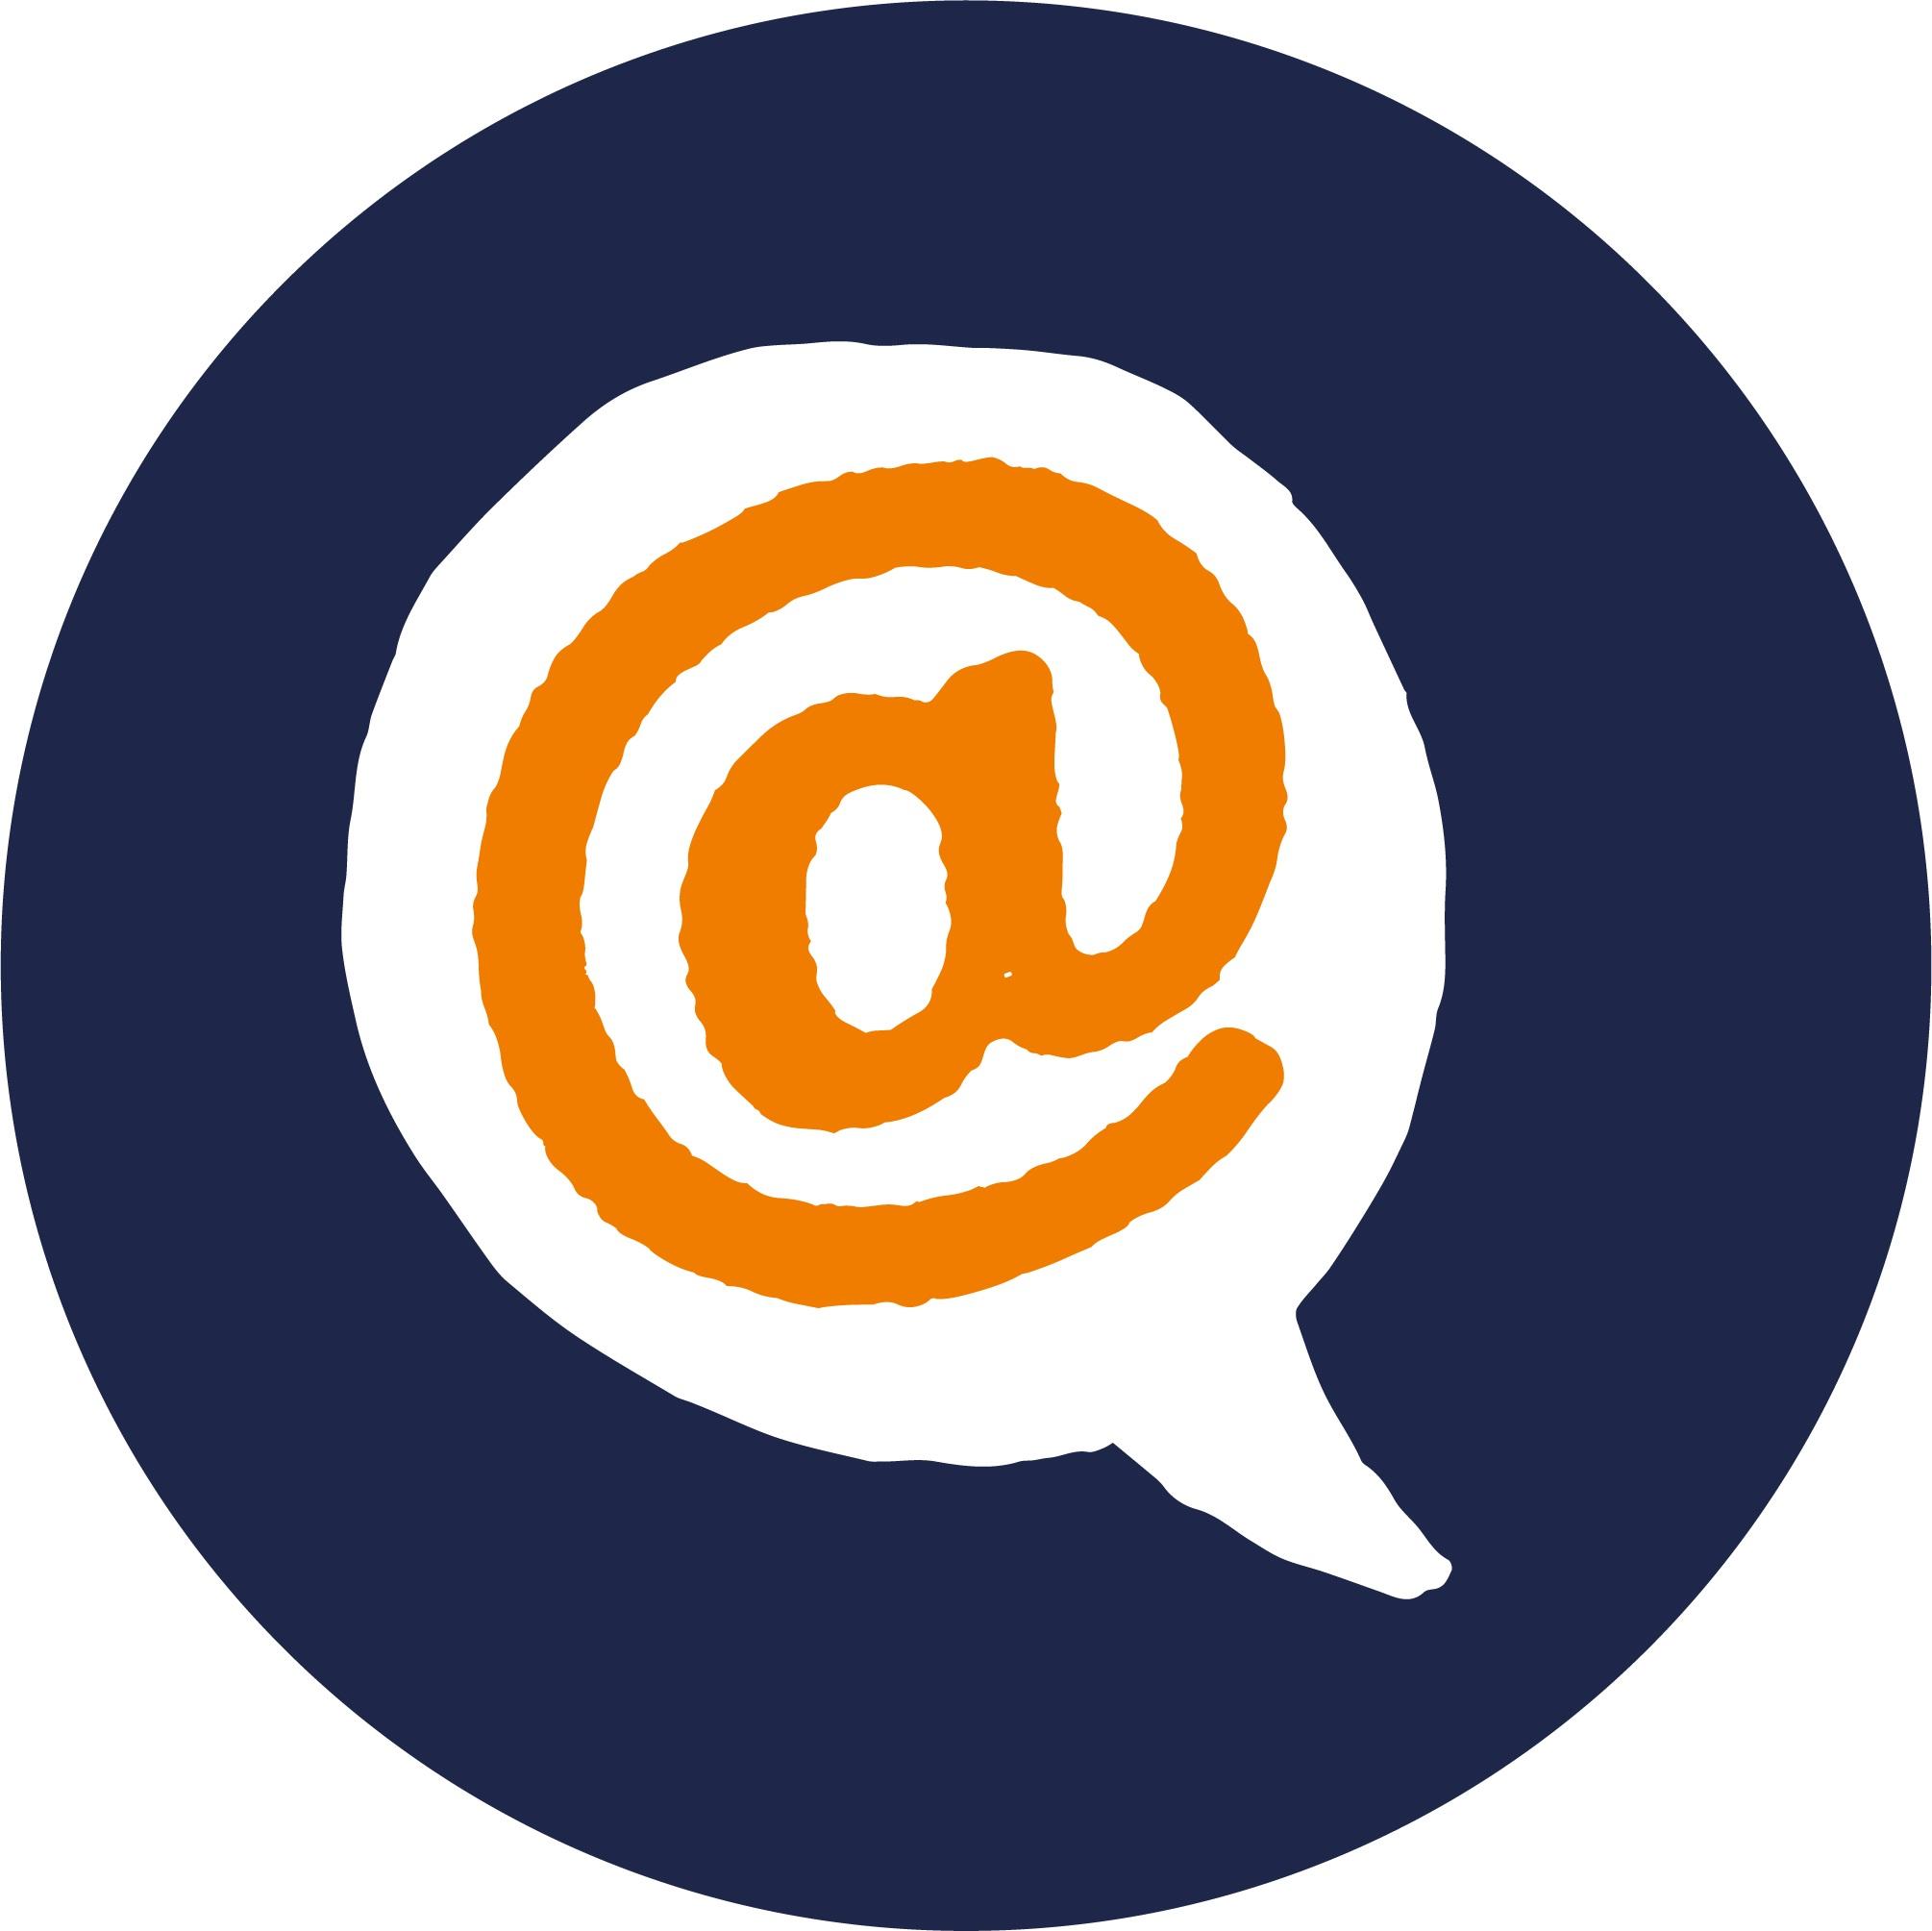 icoon-mail-SO-RW